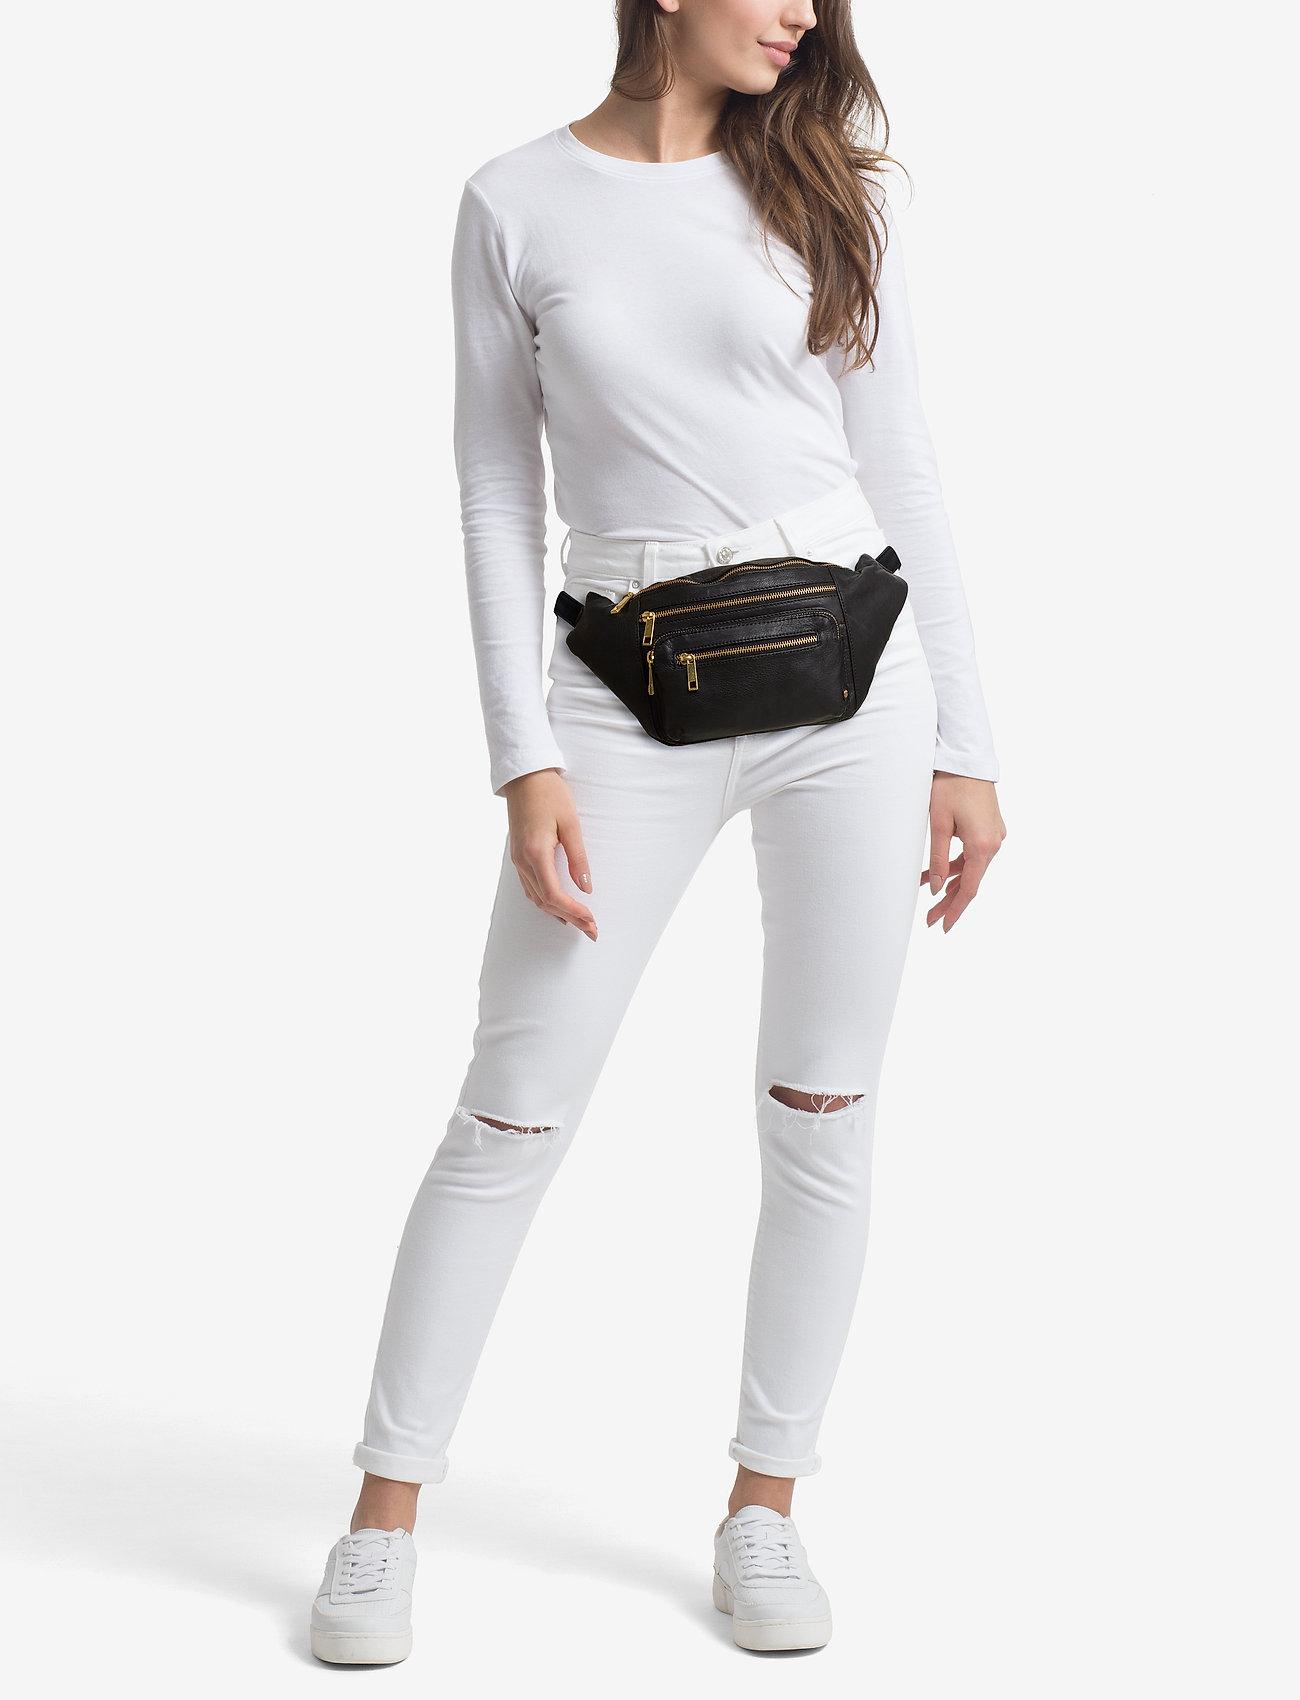 DEPECHE Bum Bag - BLACK